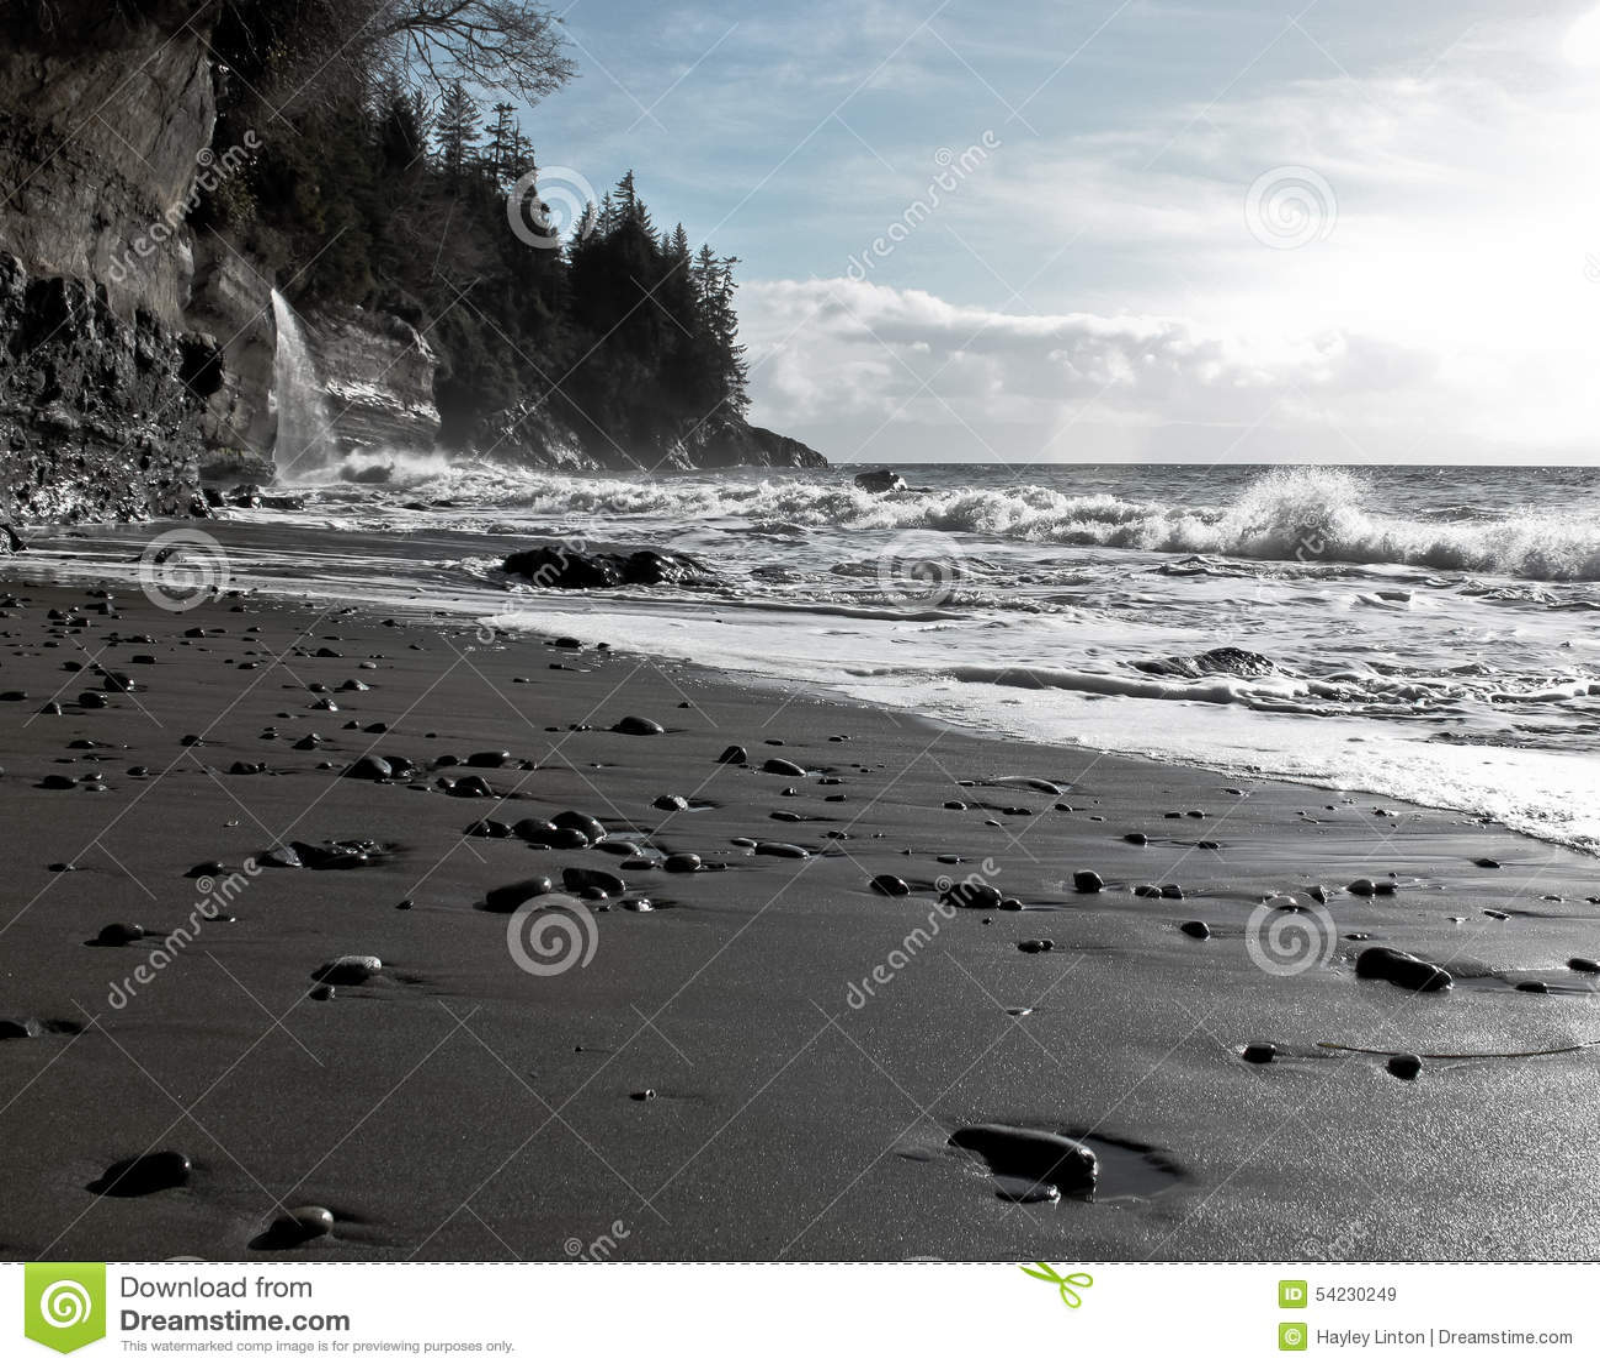 Vancouver Bc Beaches: Mystic Beach, Vancouver Island, BC, Canada Stock Photo